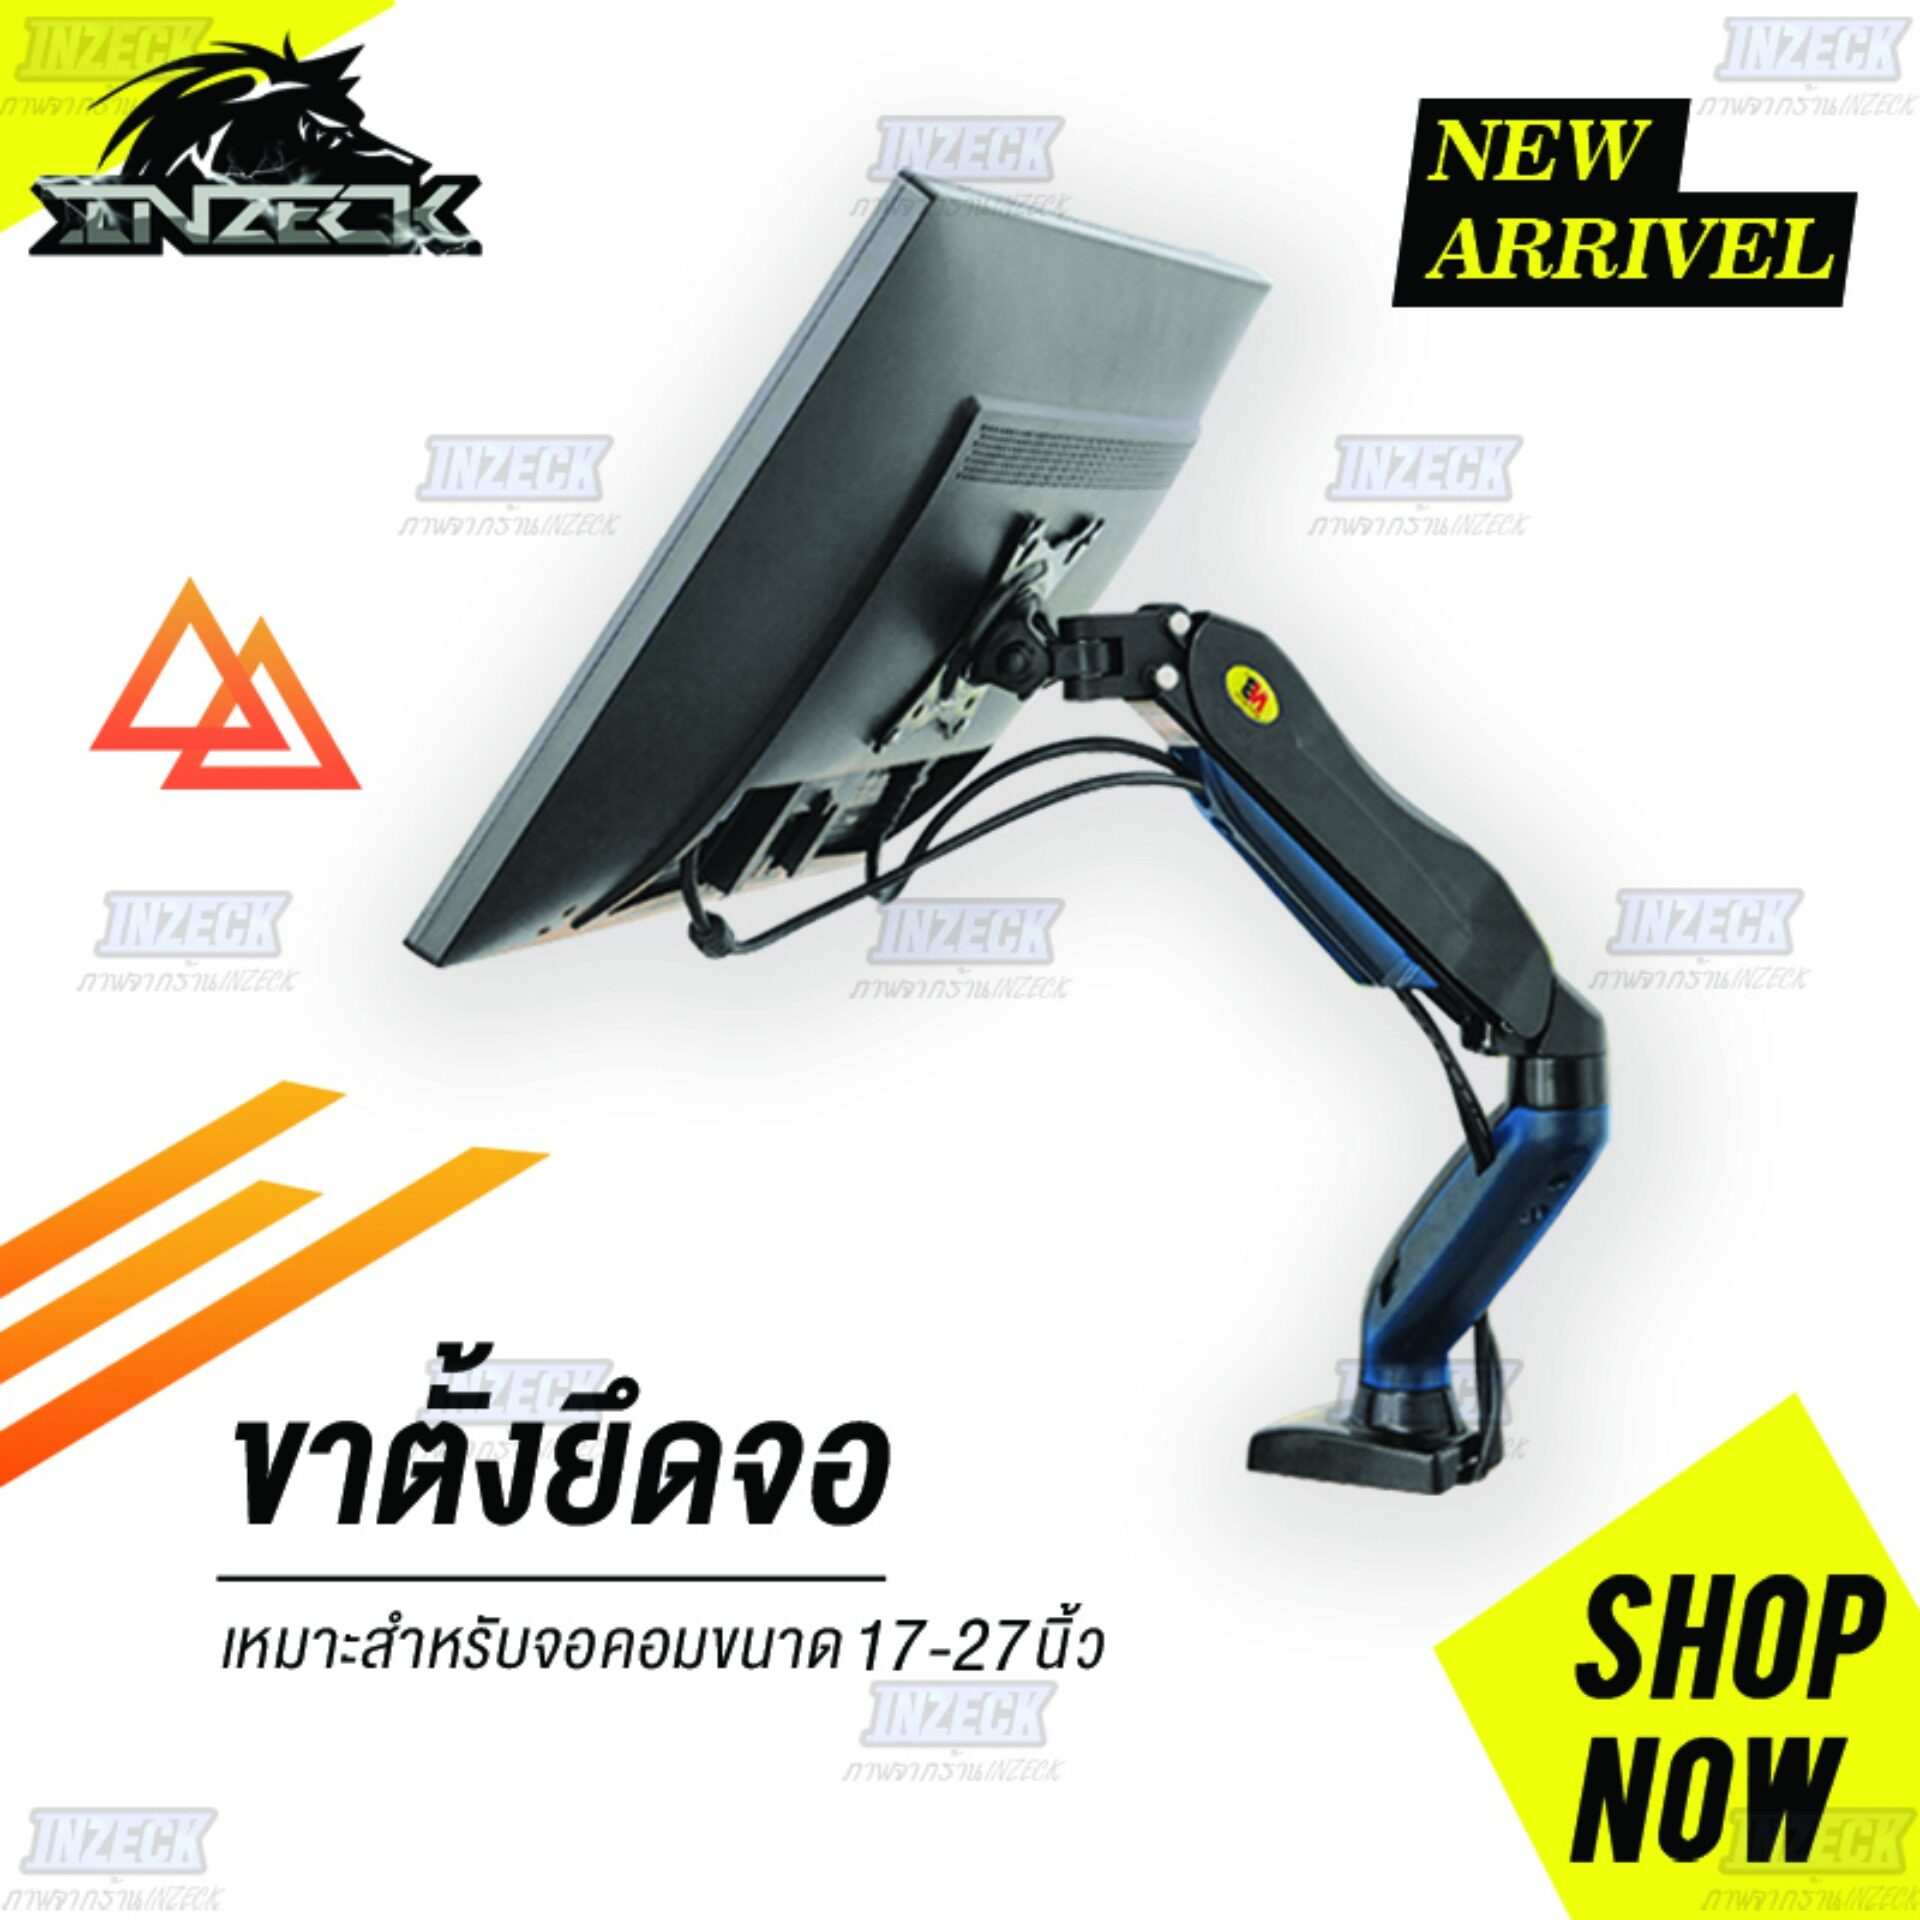 Inzeck Nb F80 ขาตั้งจอ Led ขาแขวนจอคอม ขายึดจอคอม ที่ยึดจอ แท่นยึดจอ Lcd Stand Gas Strut Desktop Gas Strut Desktop Single Monitor Stand Nbf80 ขาตั้งจอ Led, Lcd ขาแขวนจอ Lcd Stand รองรับ 17 -27.